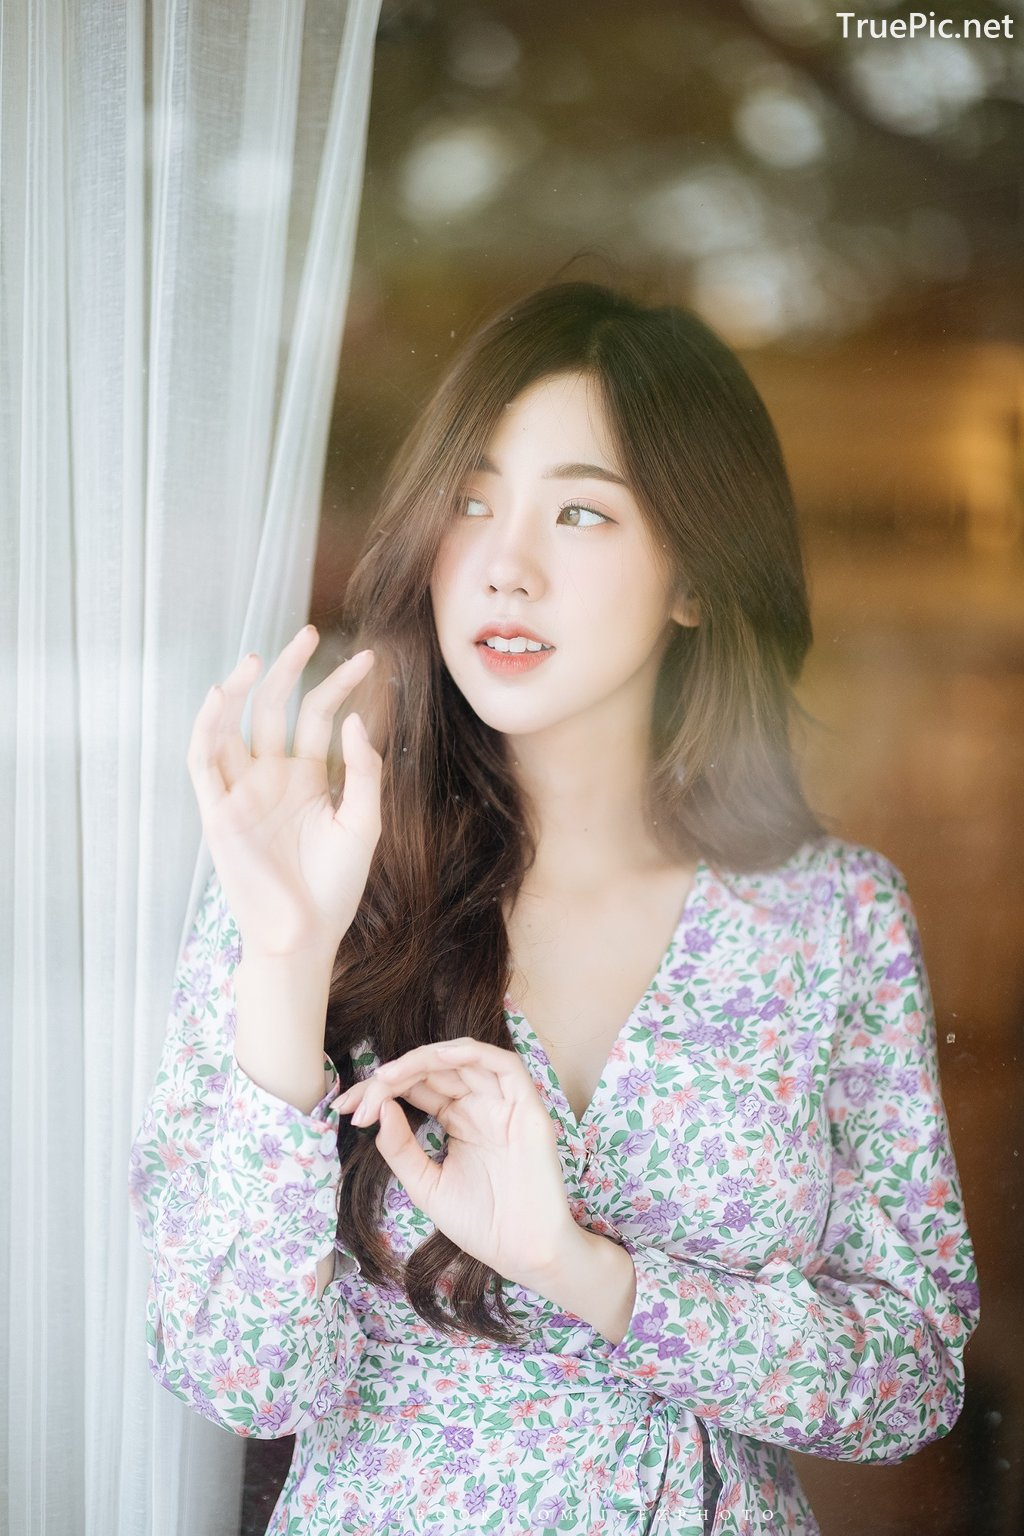 Image-Thailand-Hot-Girl-Nilawan-Iamchuasawad-Pure-Beauty-Early-Morning-TruePic.net- Picture-8